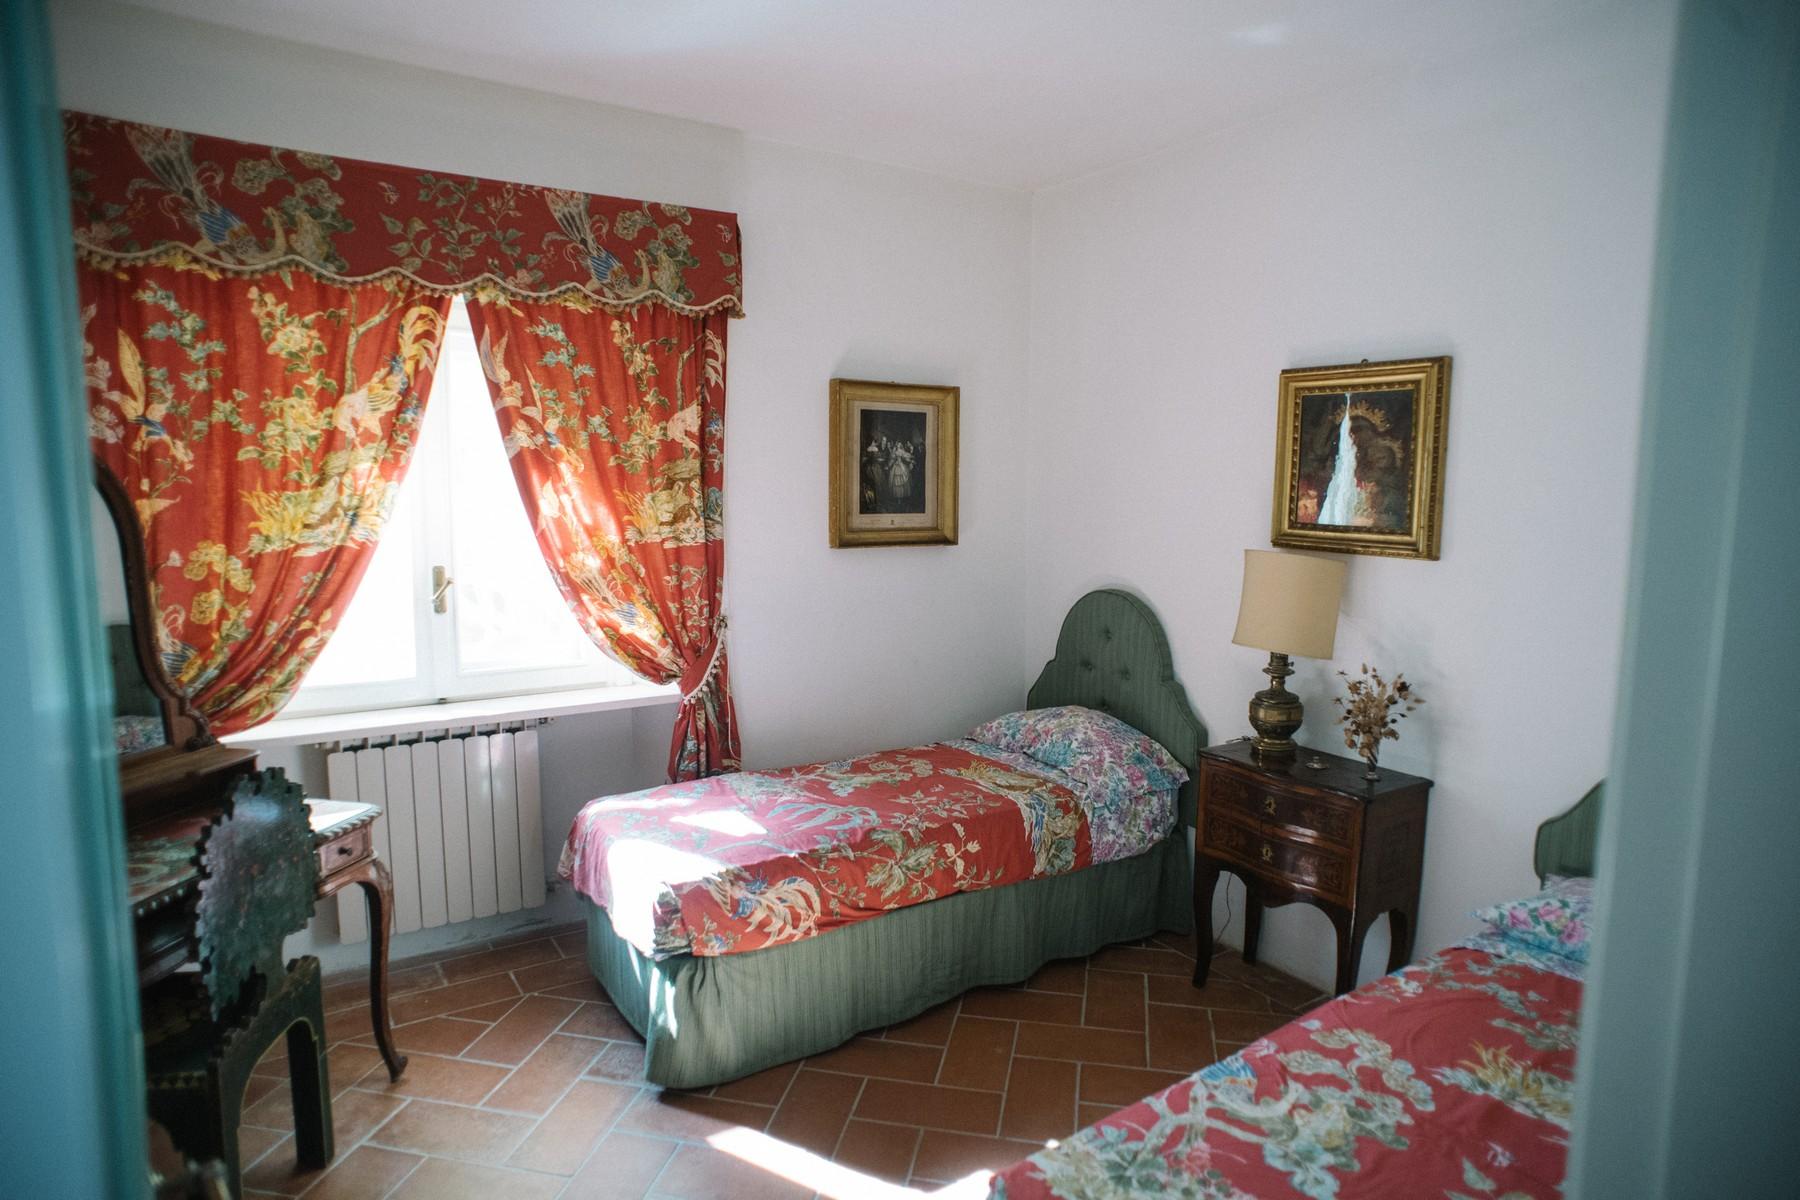 Additional photo for property listing at Capatonno Contrada in Castellaneta Castellaneta, Taranto Italy